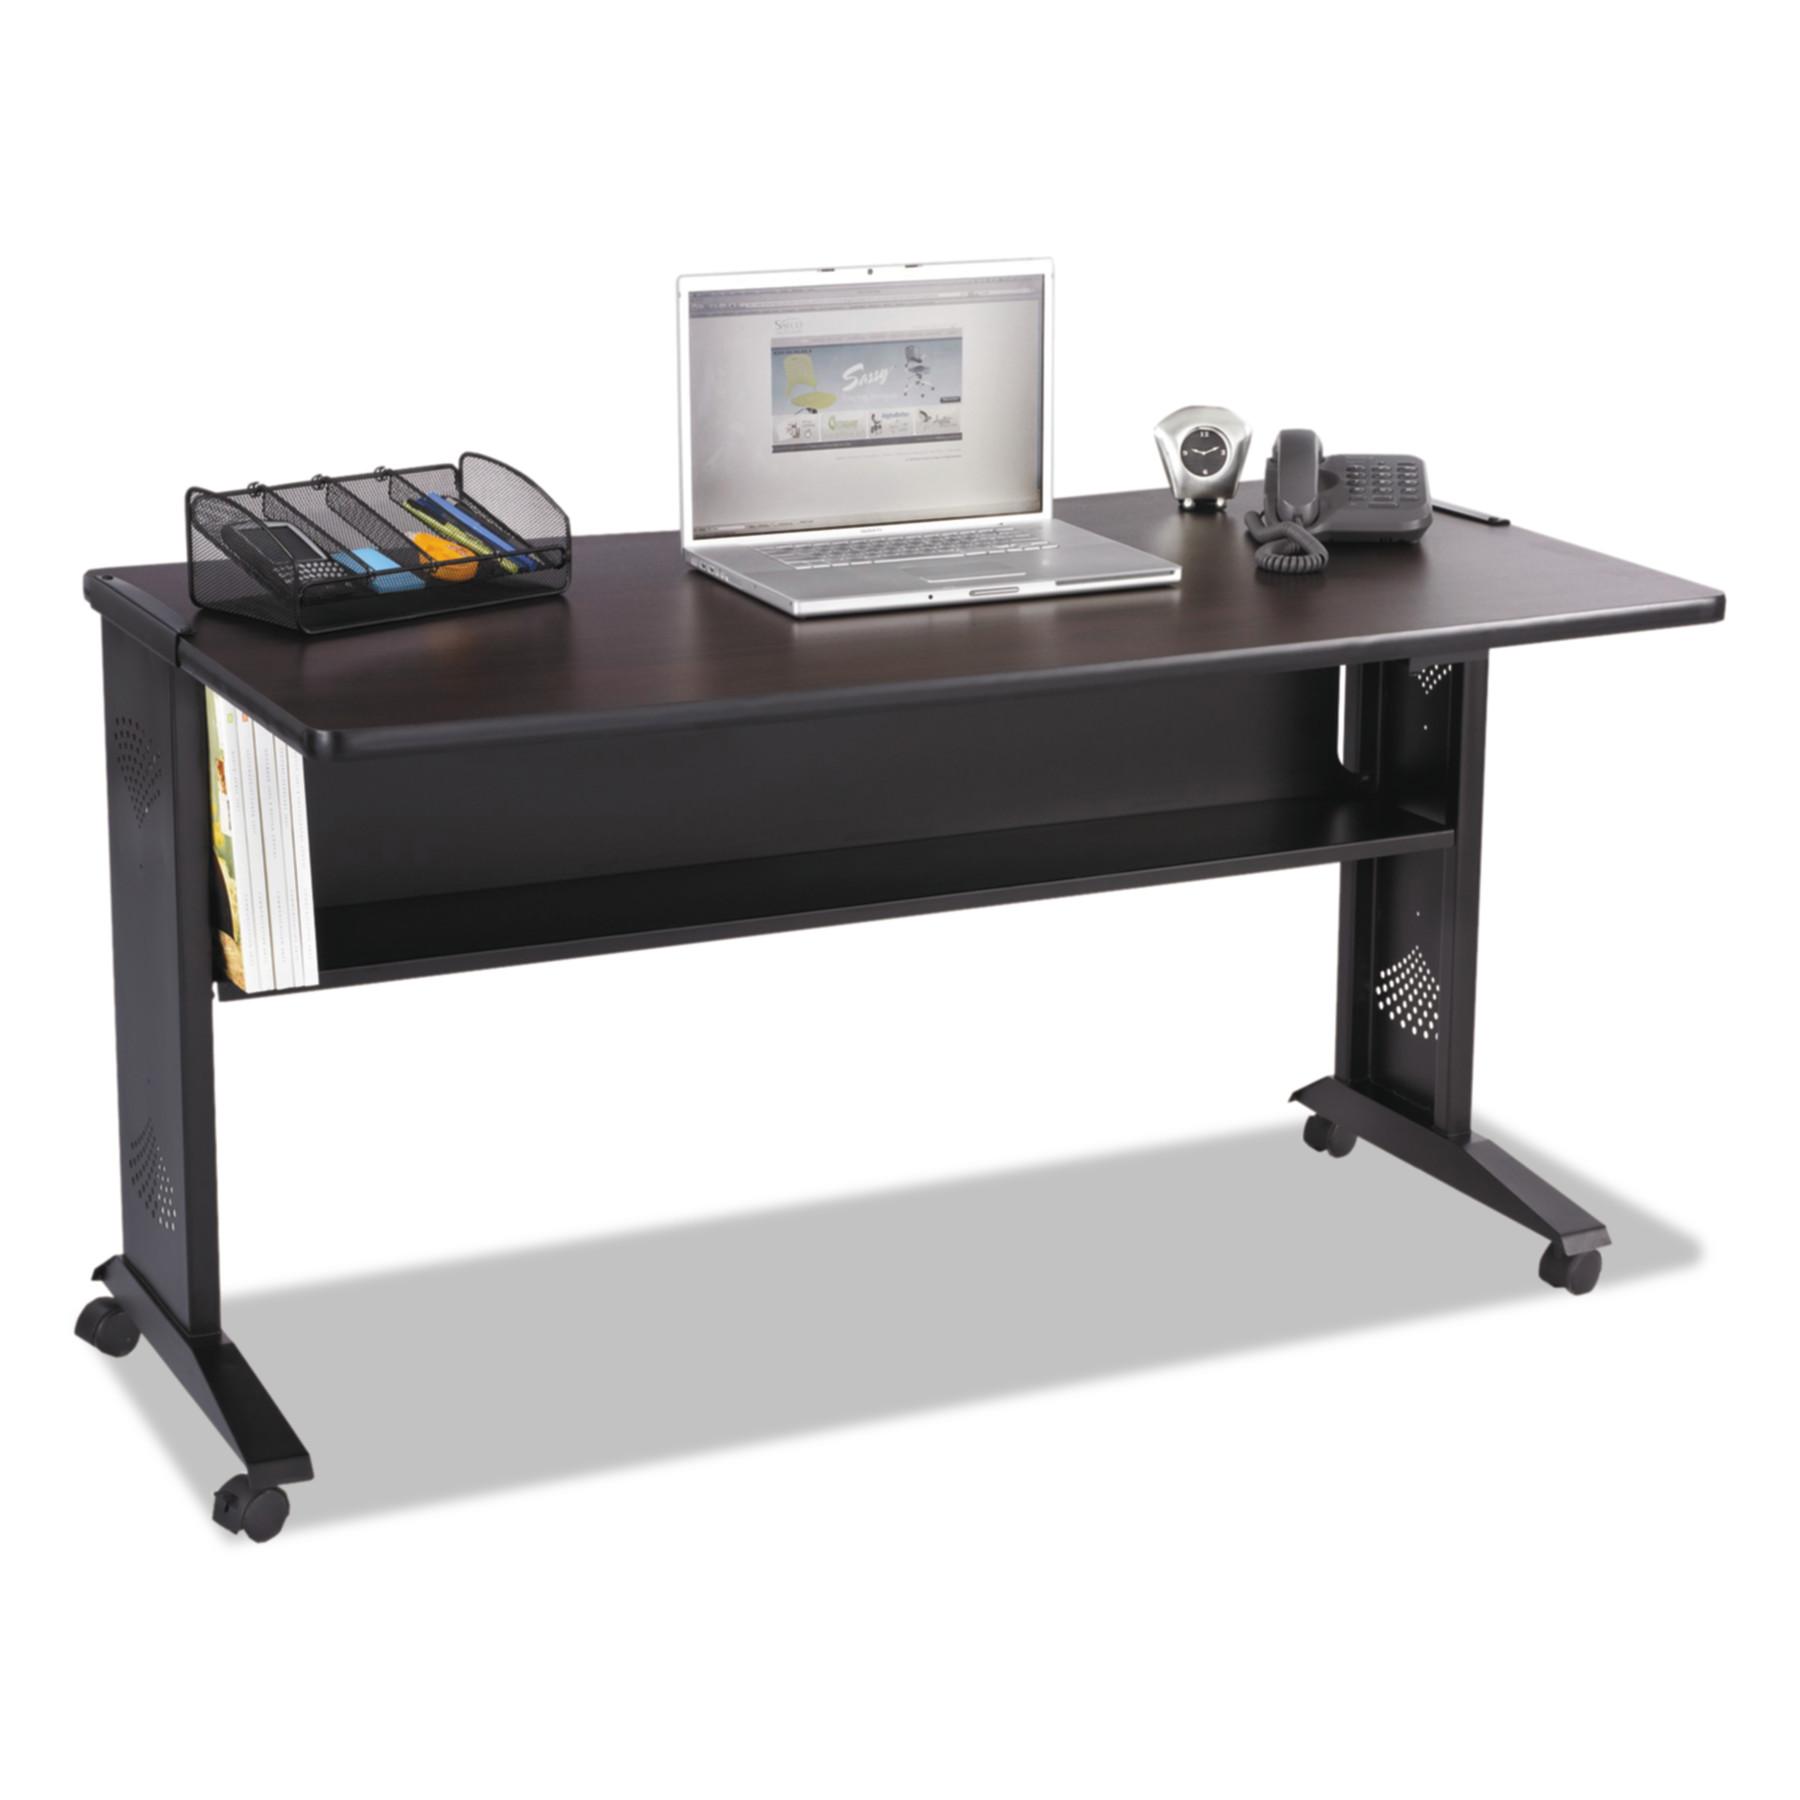 Safco Mobile Computer Desk W/Reversible Top, 53.5 x 28 x 30, Mahogany/Medium Oak/Black